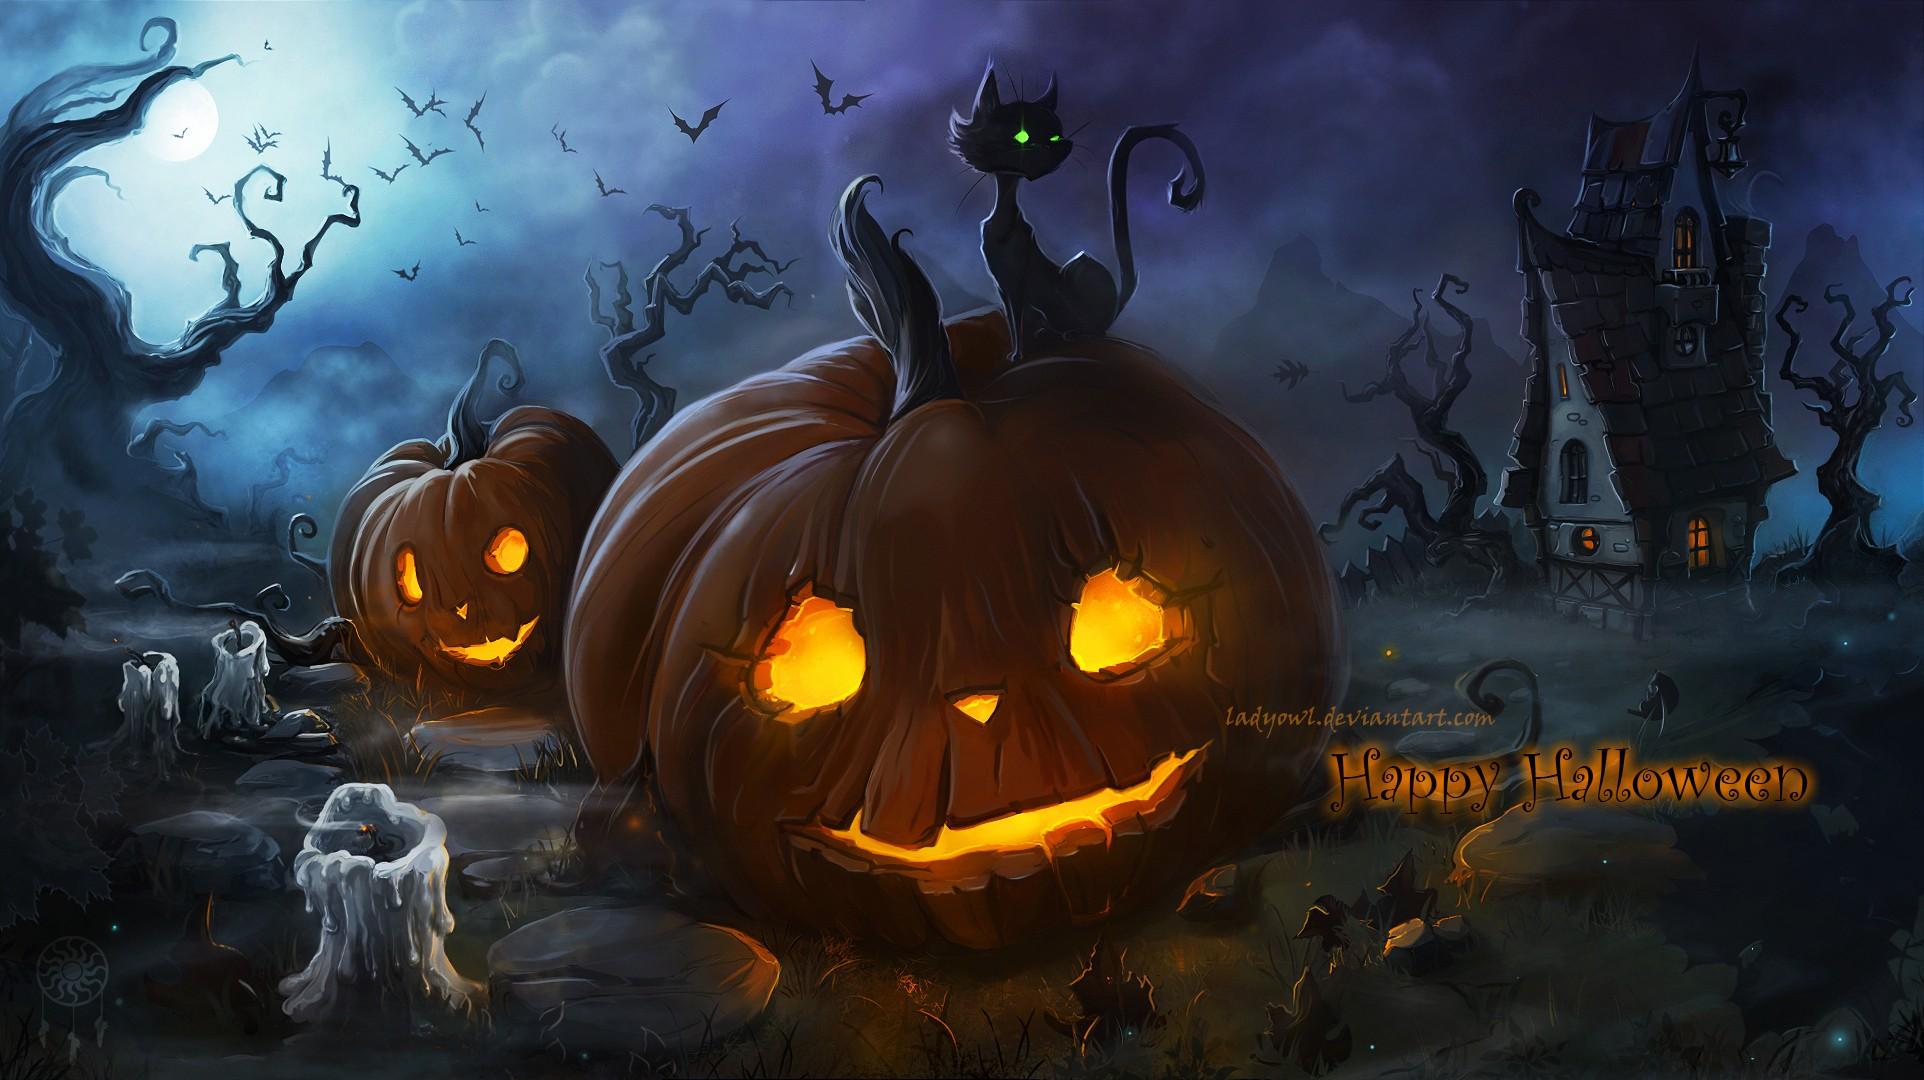 illustration cat fantasy art night spooky Halloween pumpkin candles Moon glowing eyes midnight darkness screenshot computer wallpaper 210041